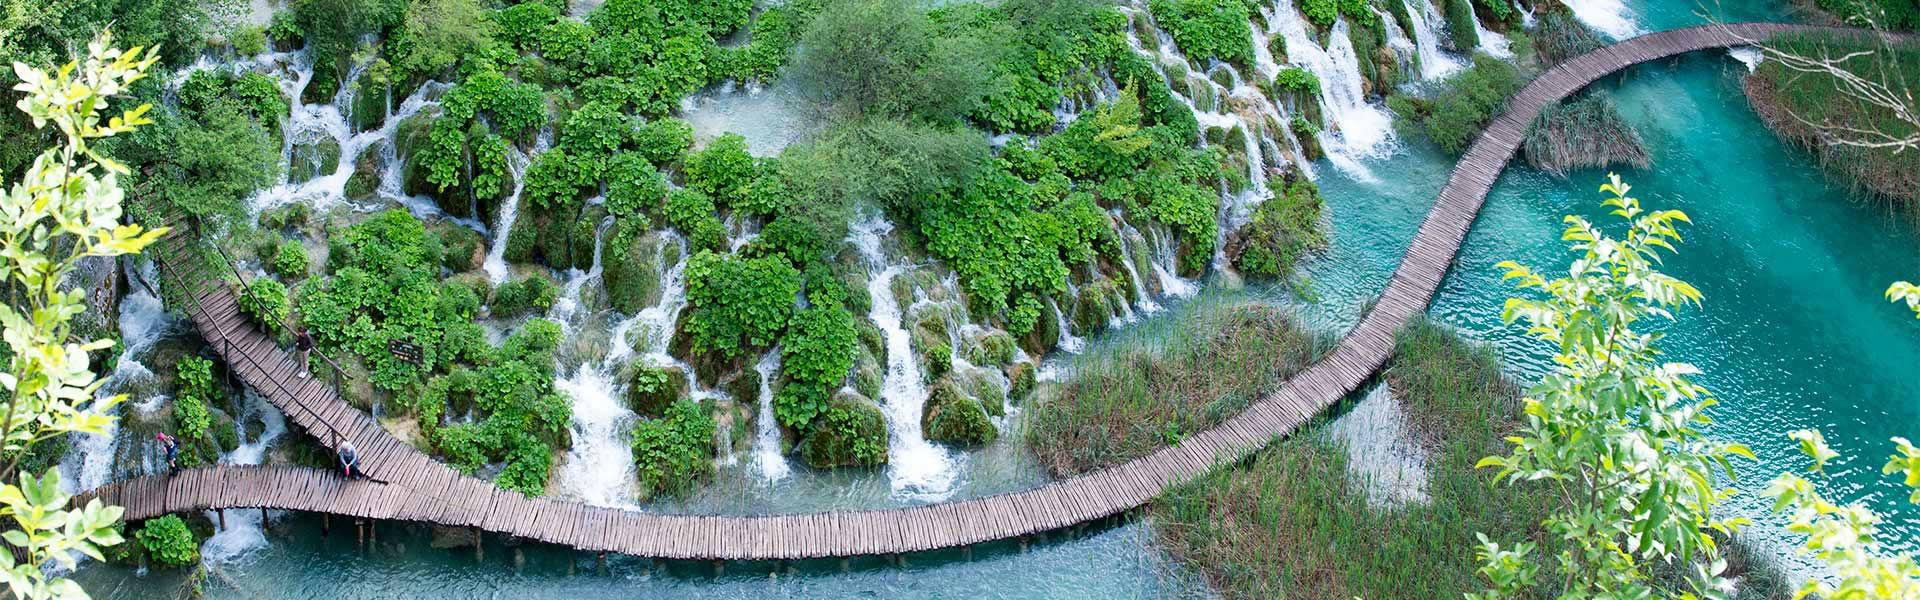 Lávka mezi jezery Kaluderovac a Gavanovac